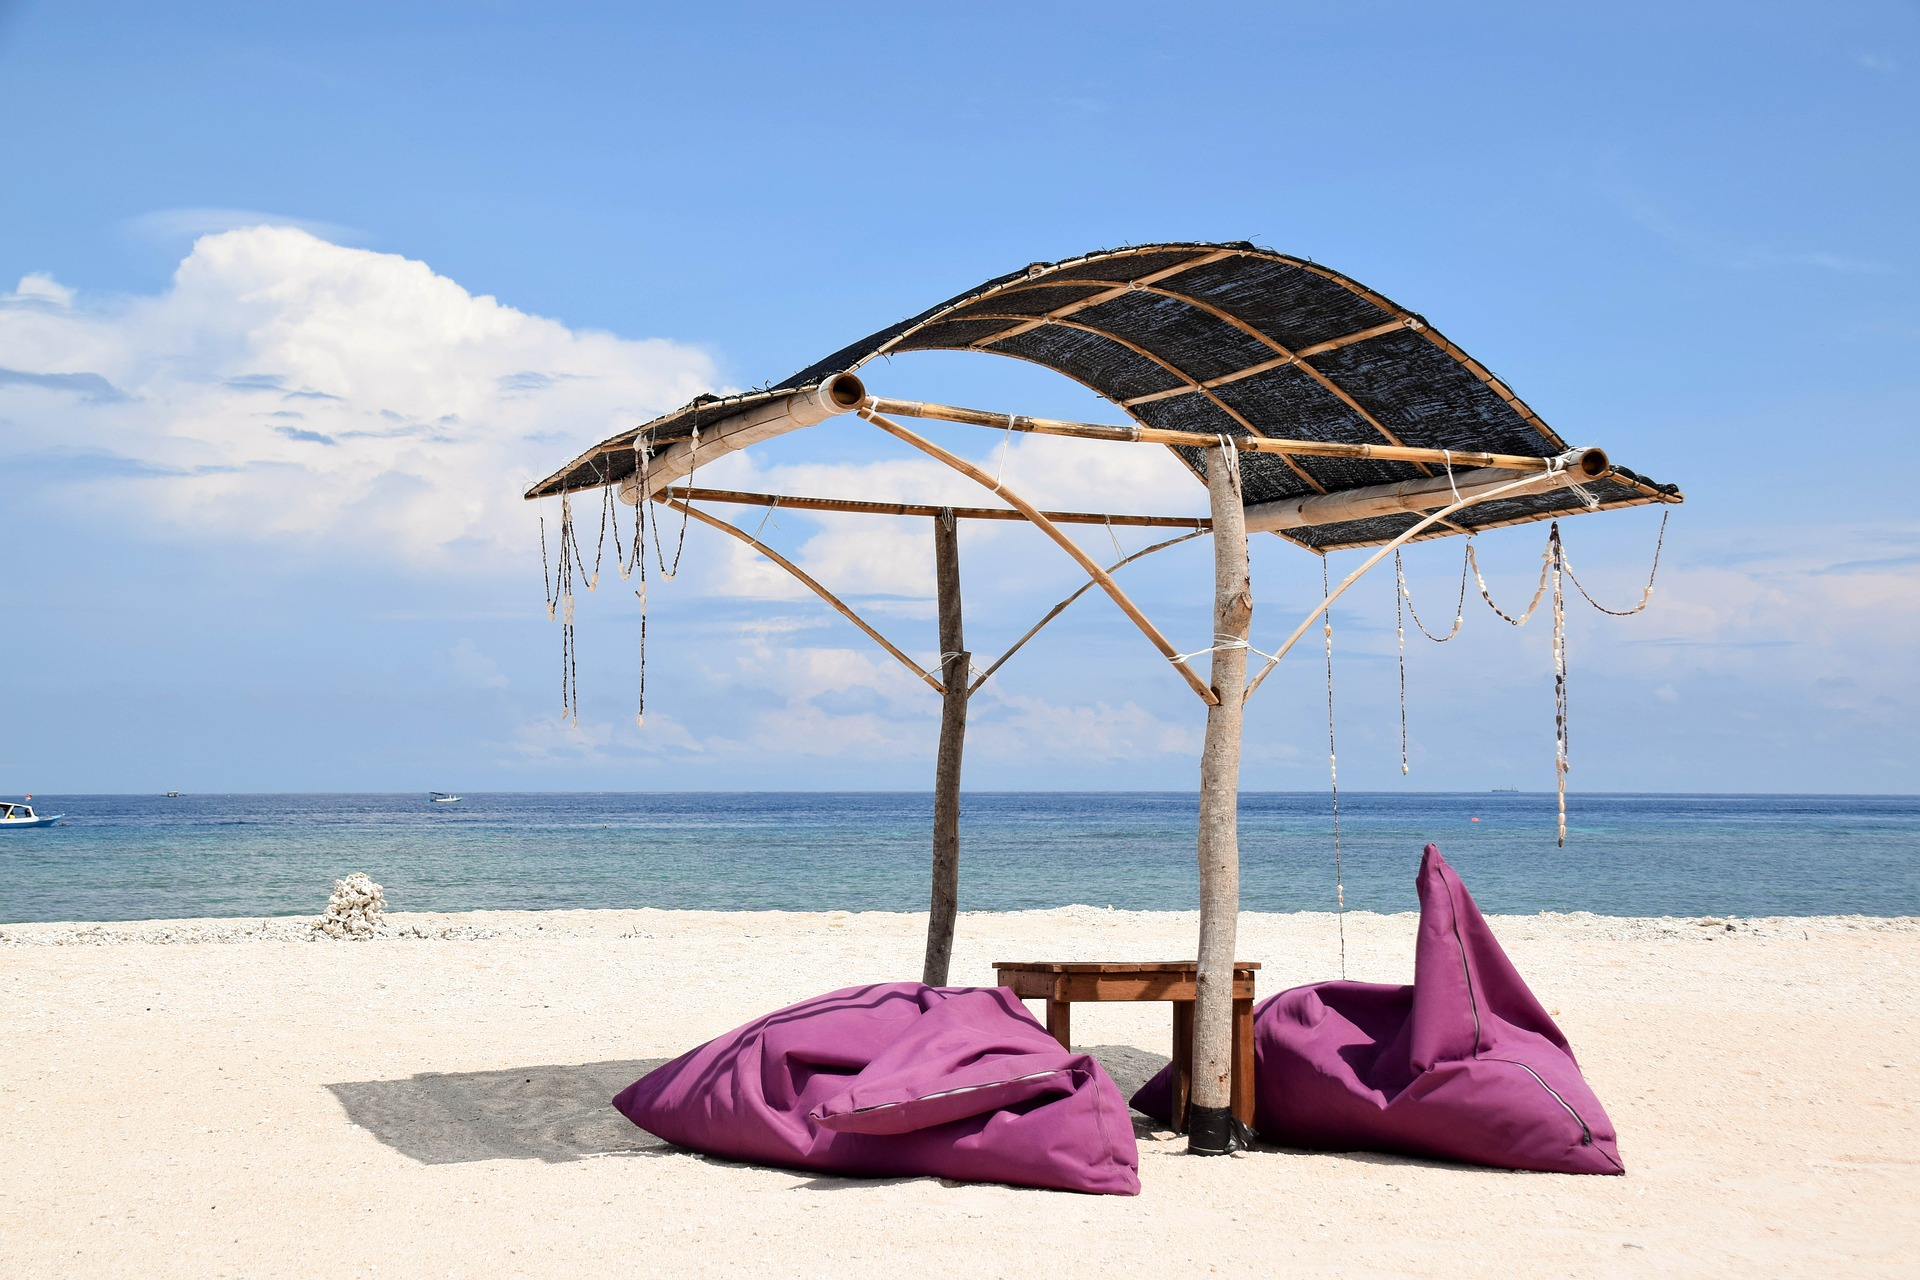 Gili Islands - Bali